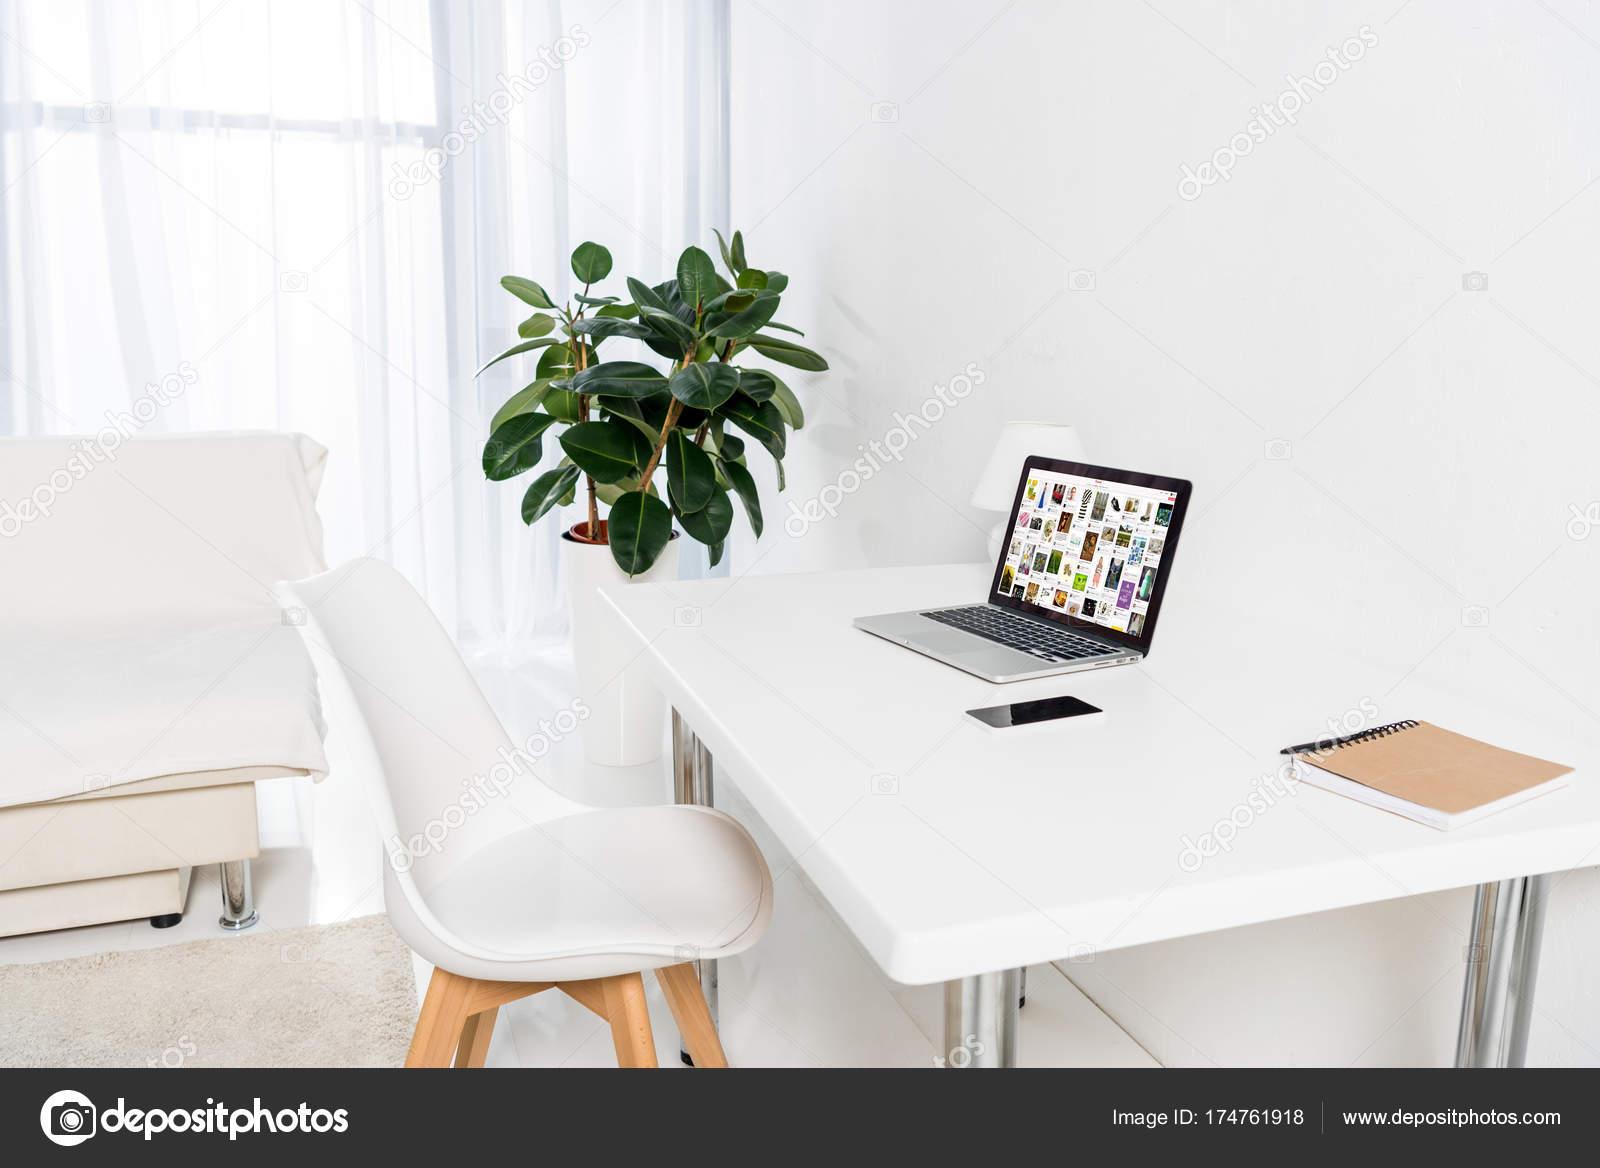 https://st3.depositphotos.com/12982378/17476/i/1600/depositphotos_174761918-stockafbeelding-laptop-met-pinterest-website-scherm.jpg